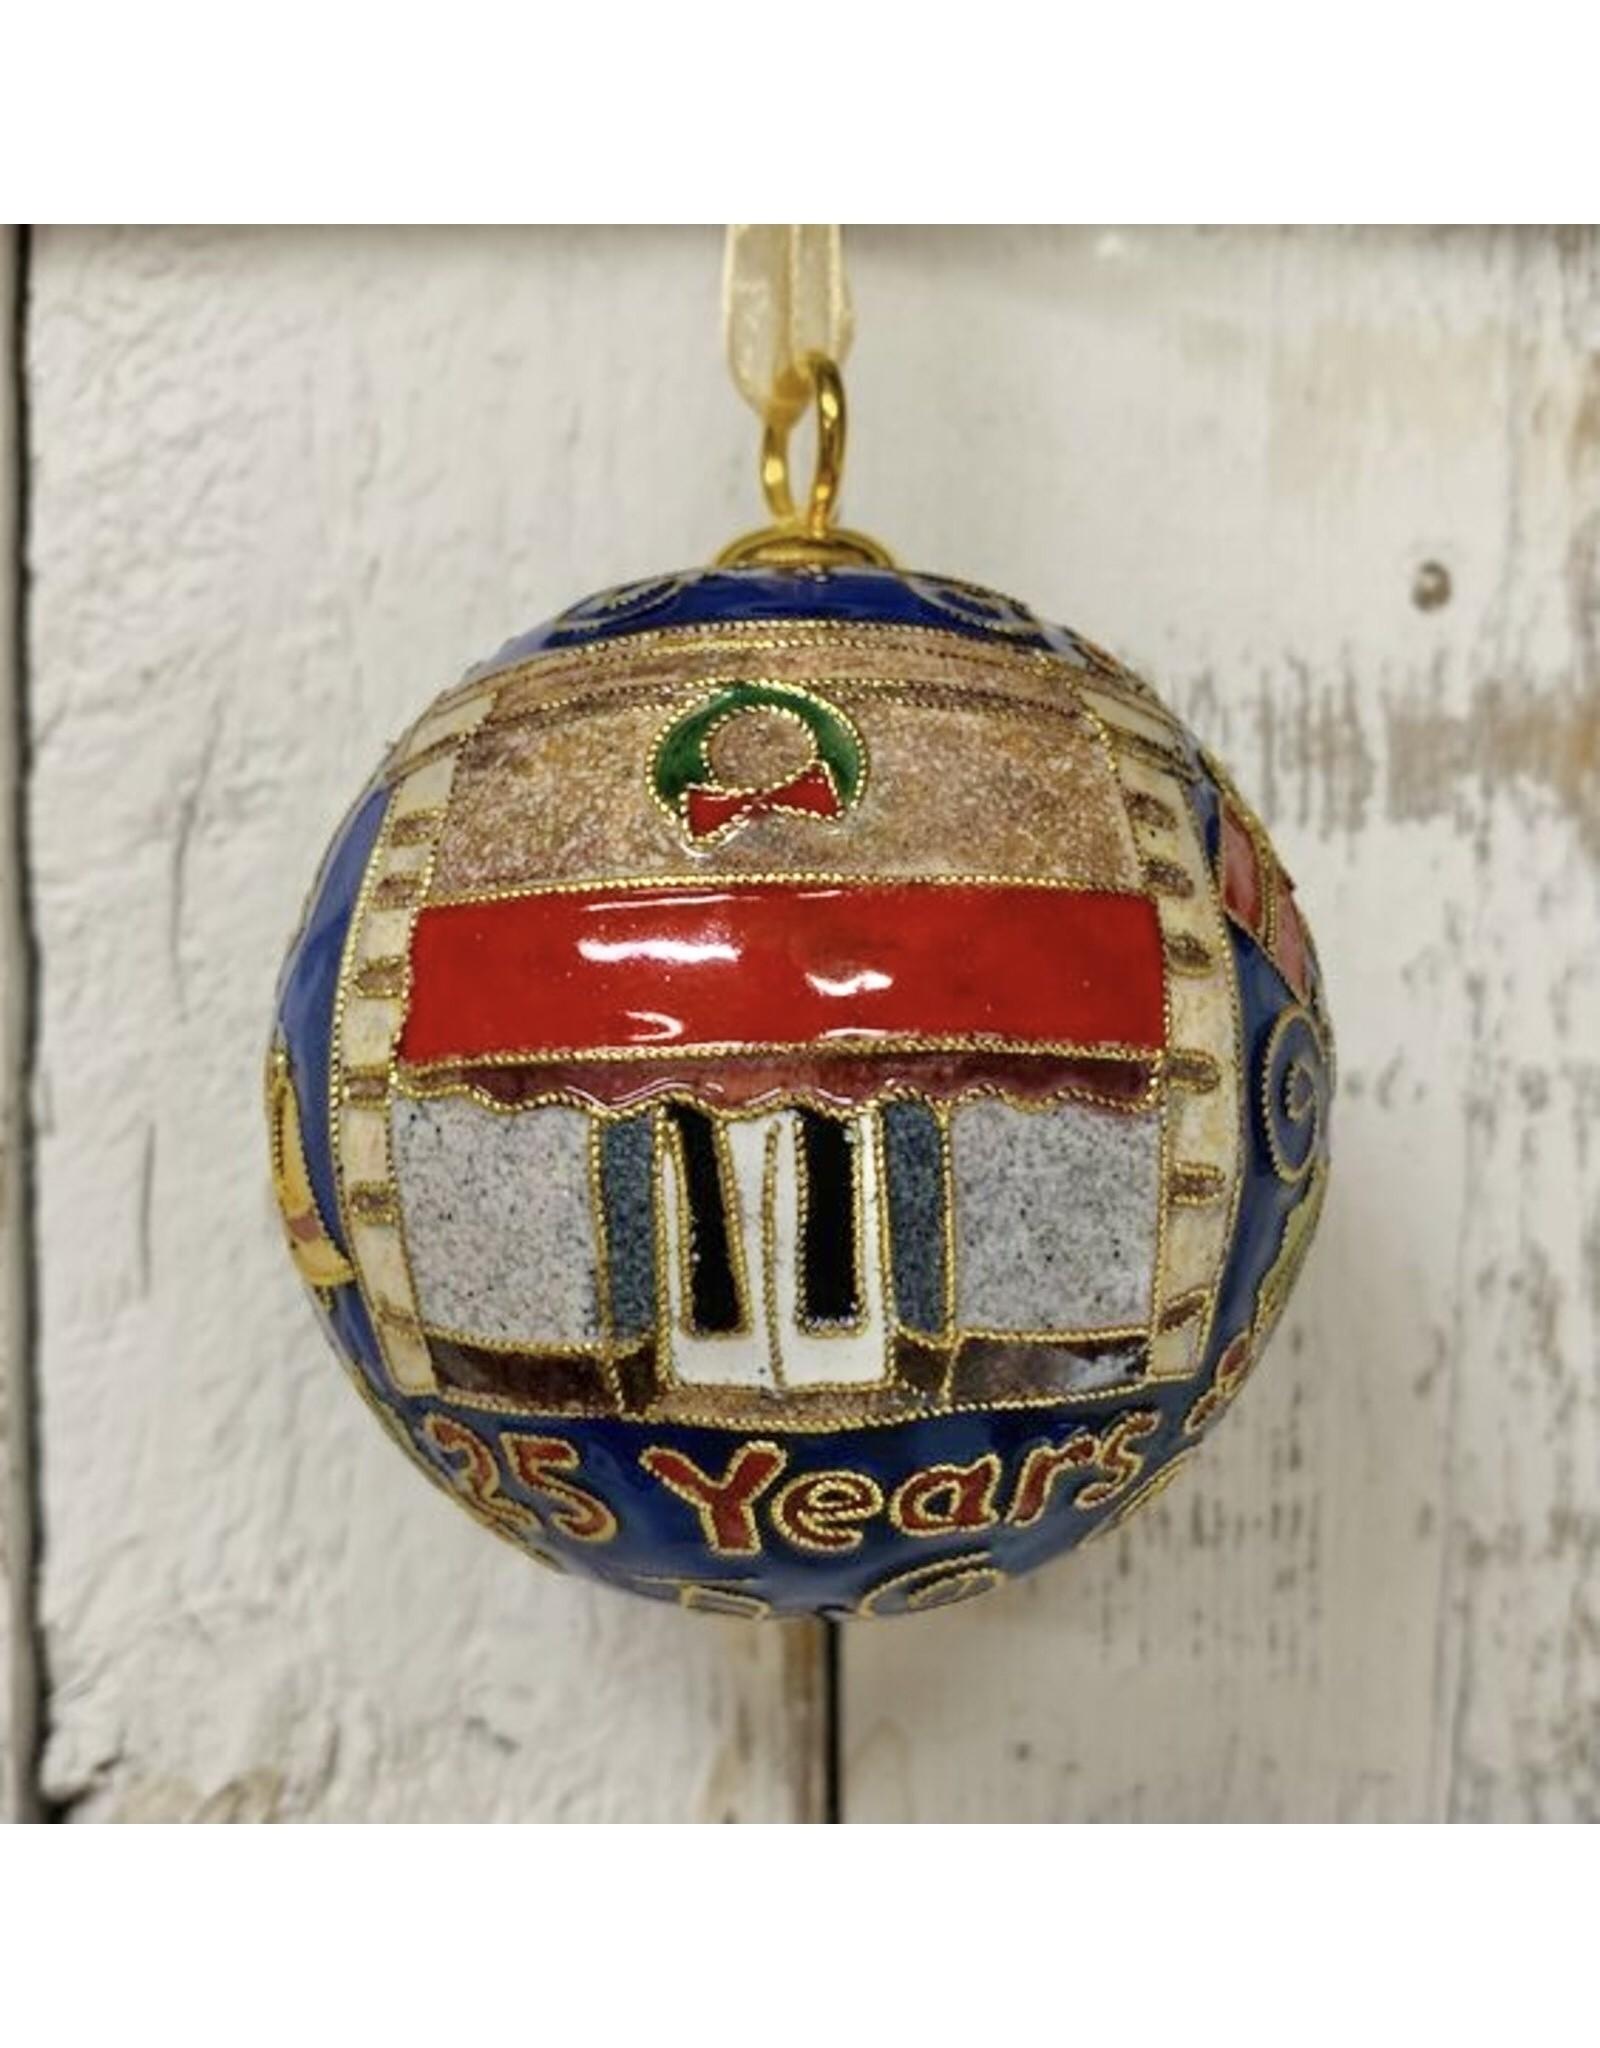 Kitty Keller TCS 25th Anniversary Boerne Cloisonné Ornament